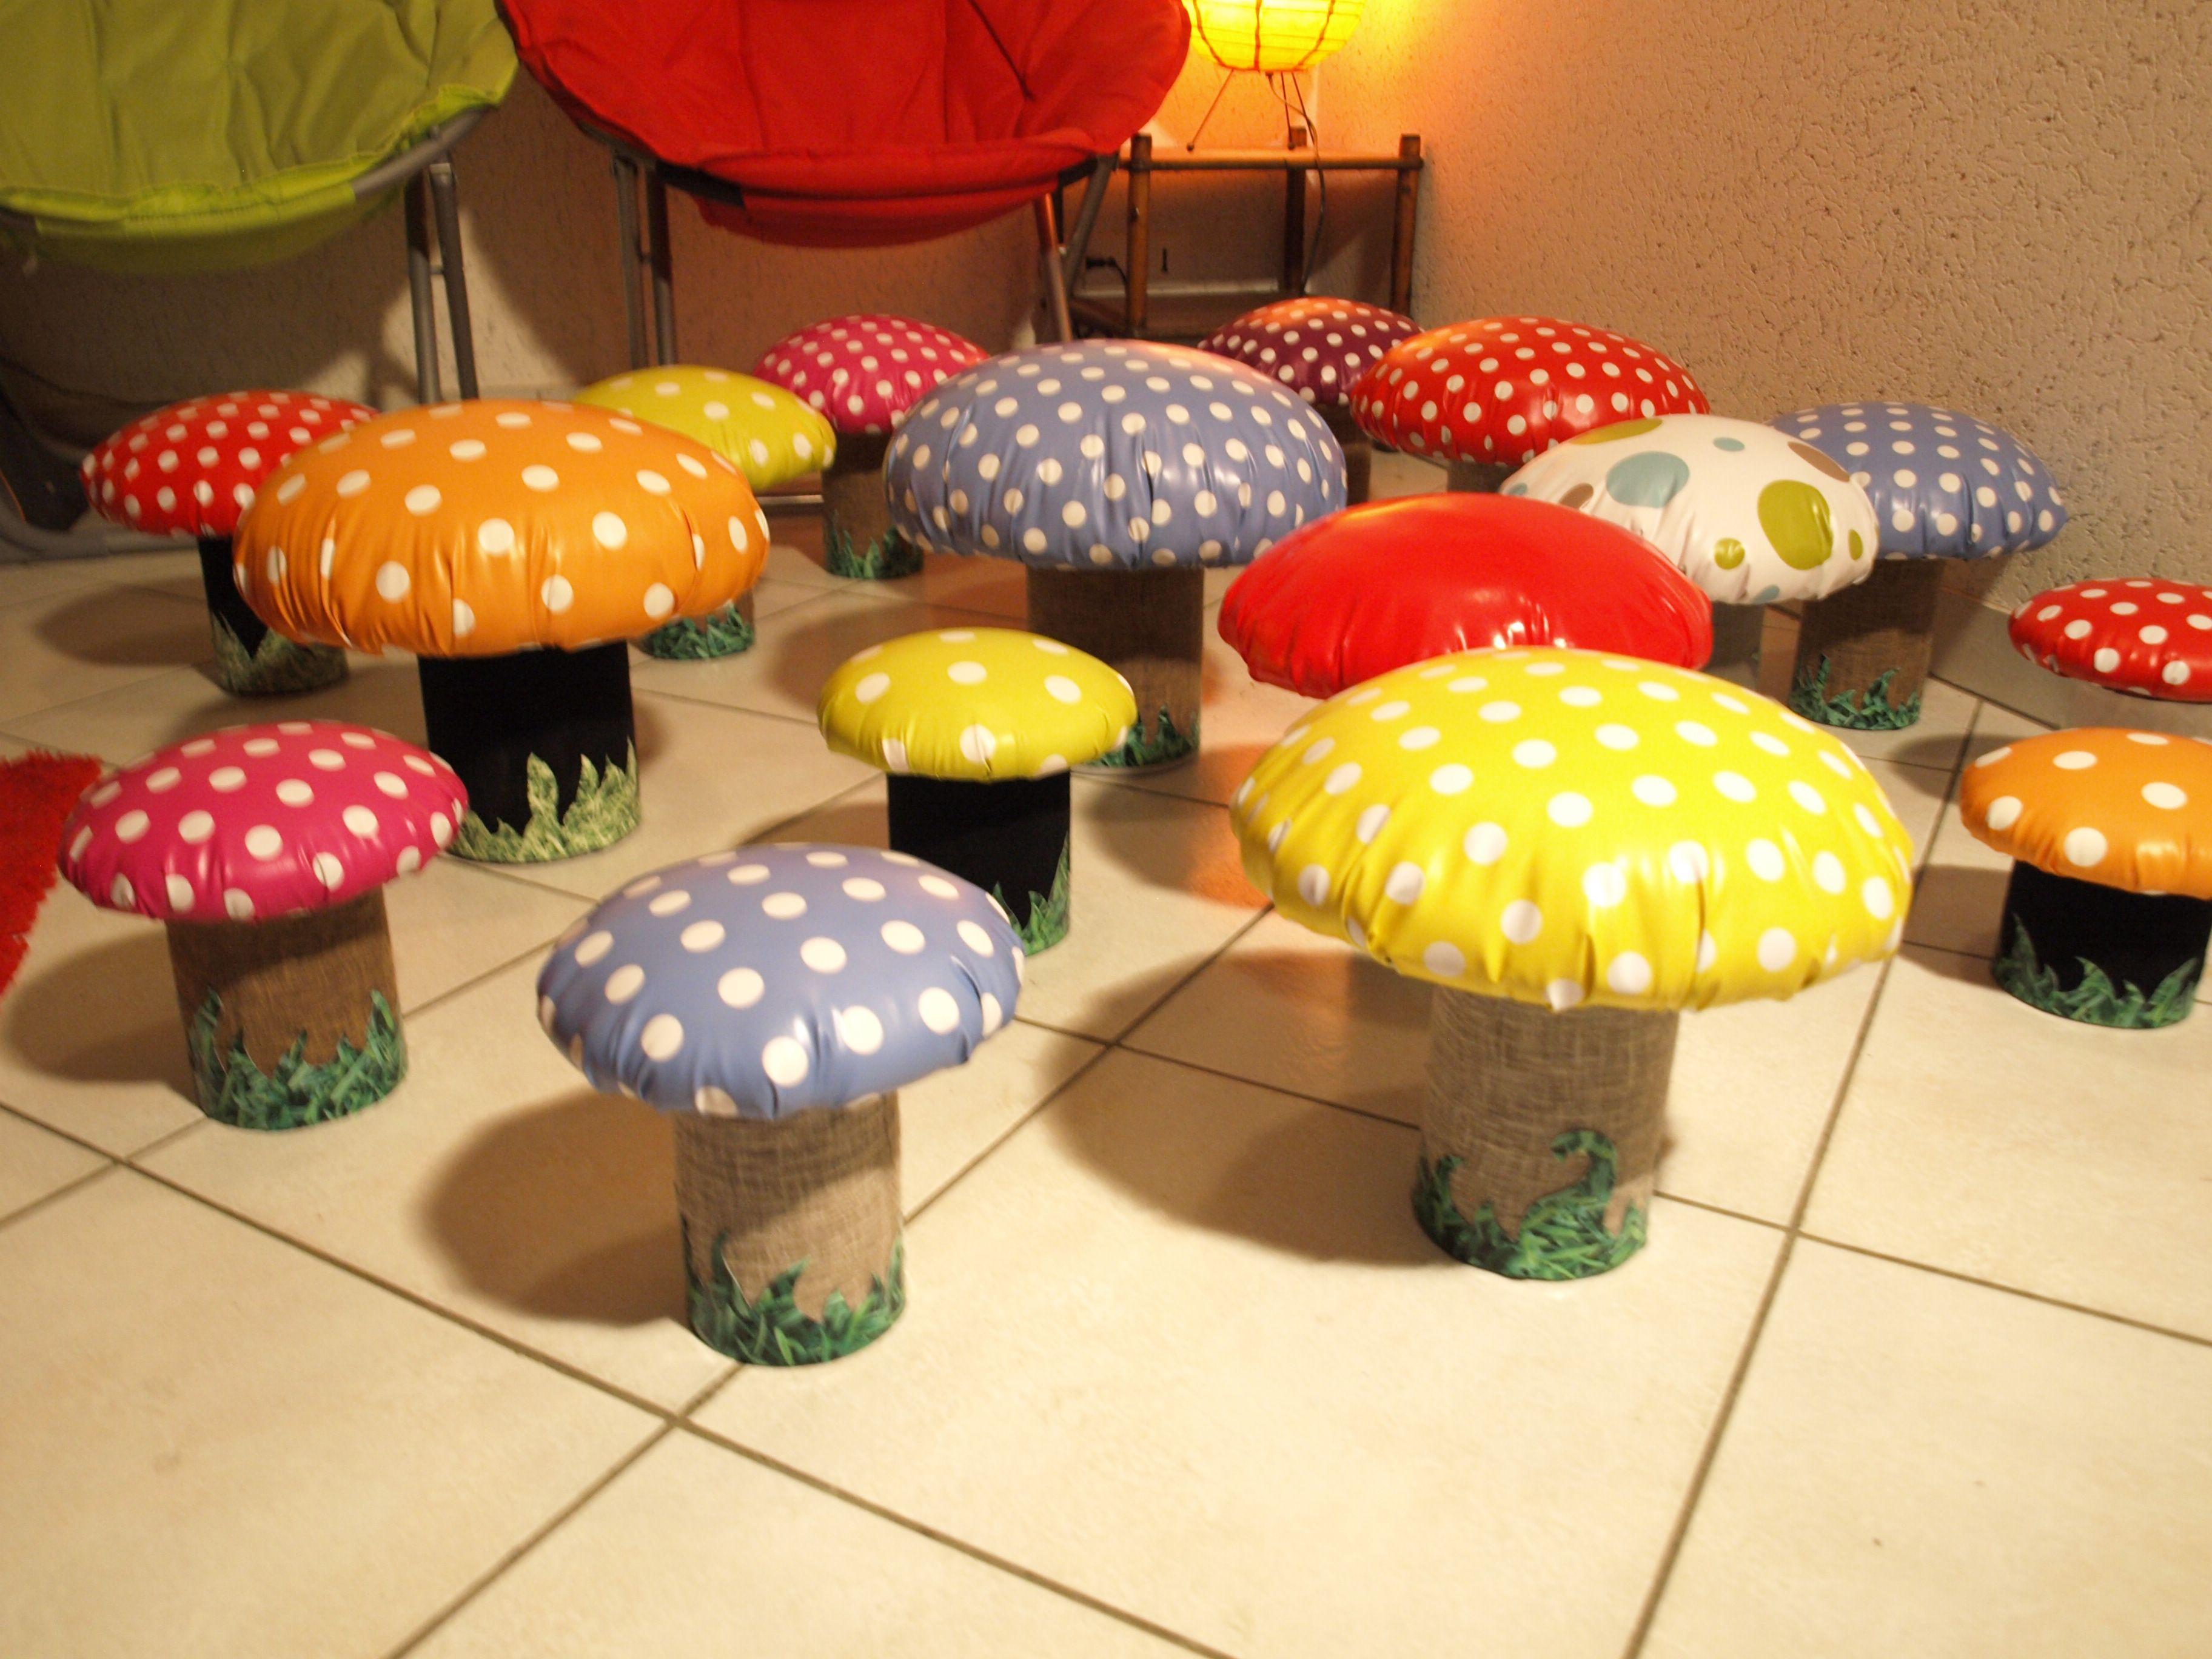 tabourets bo tes champignons r alis s en boites en m tal de r cup 39 upcycling recyclage r cup. Black Bedroom Furniture Sets. Home Design Ideas